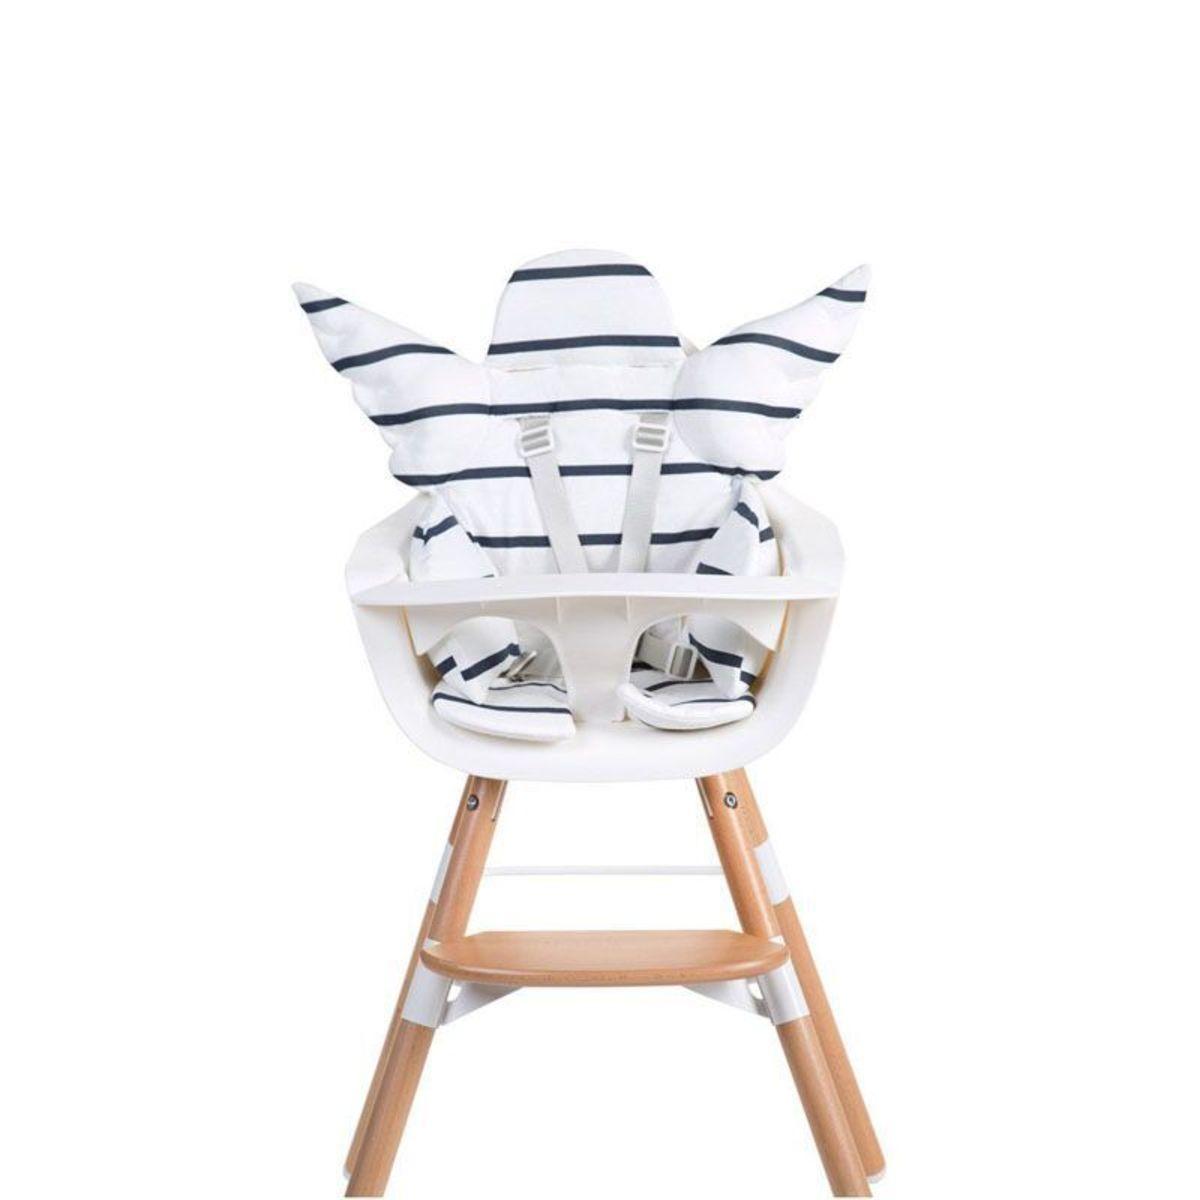 EVOLU ONE.80旋轉 成長餐椅(白/原木) 連造型坐墊及餐盤